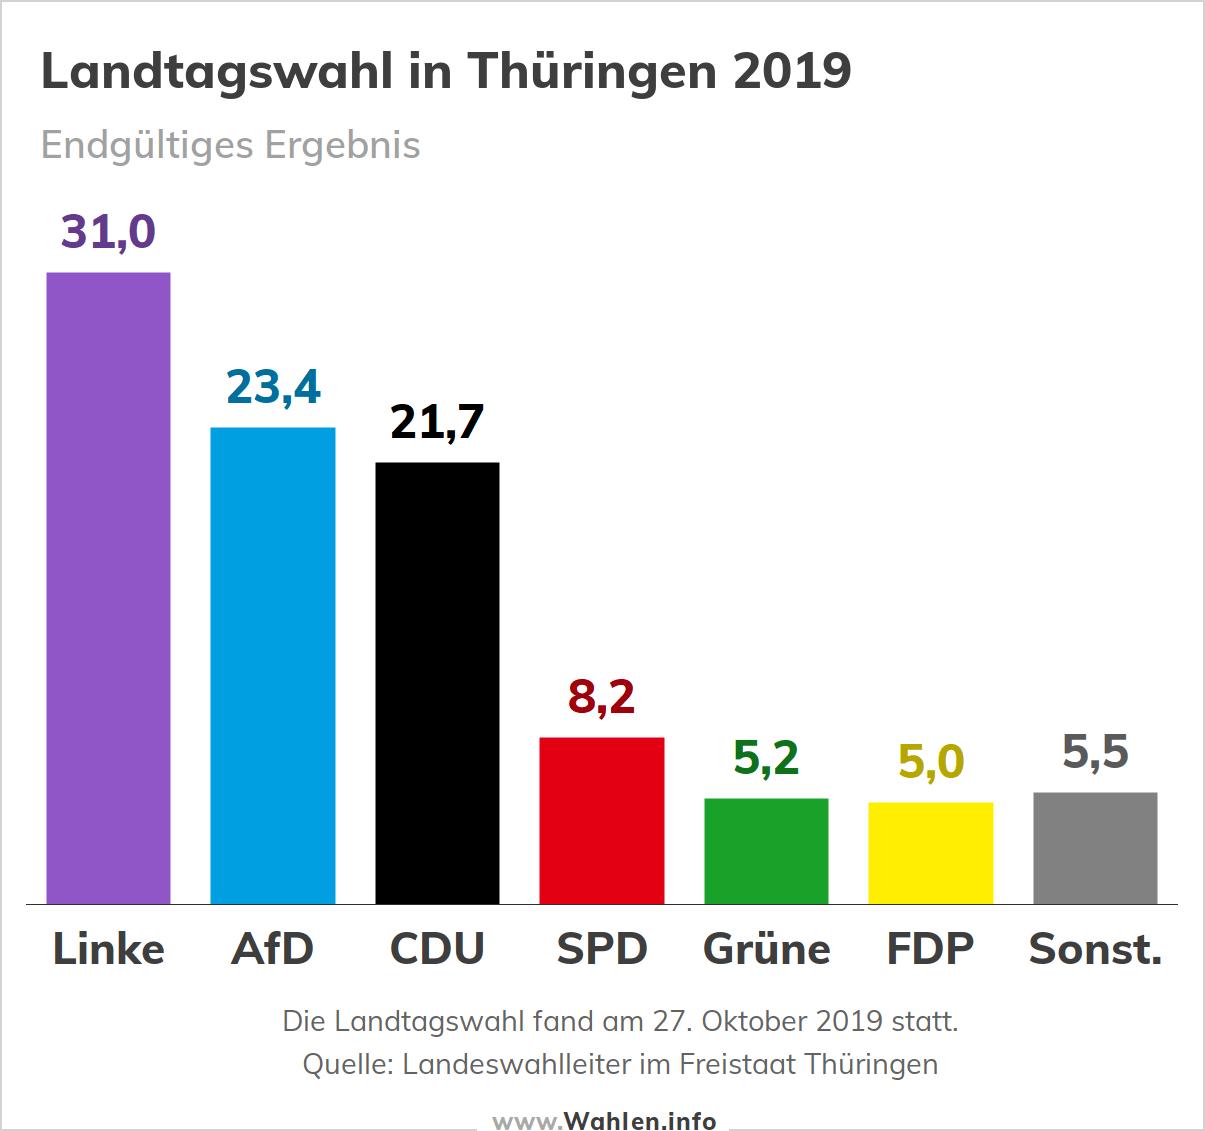 Ergebnis der Landtagswahl in Thüringen